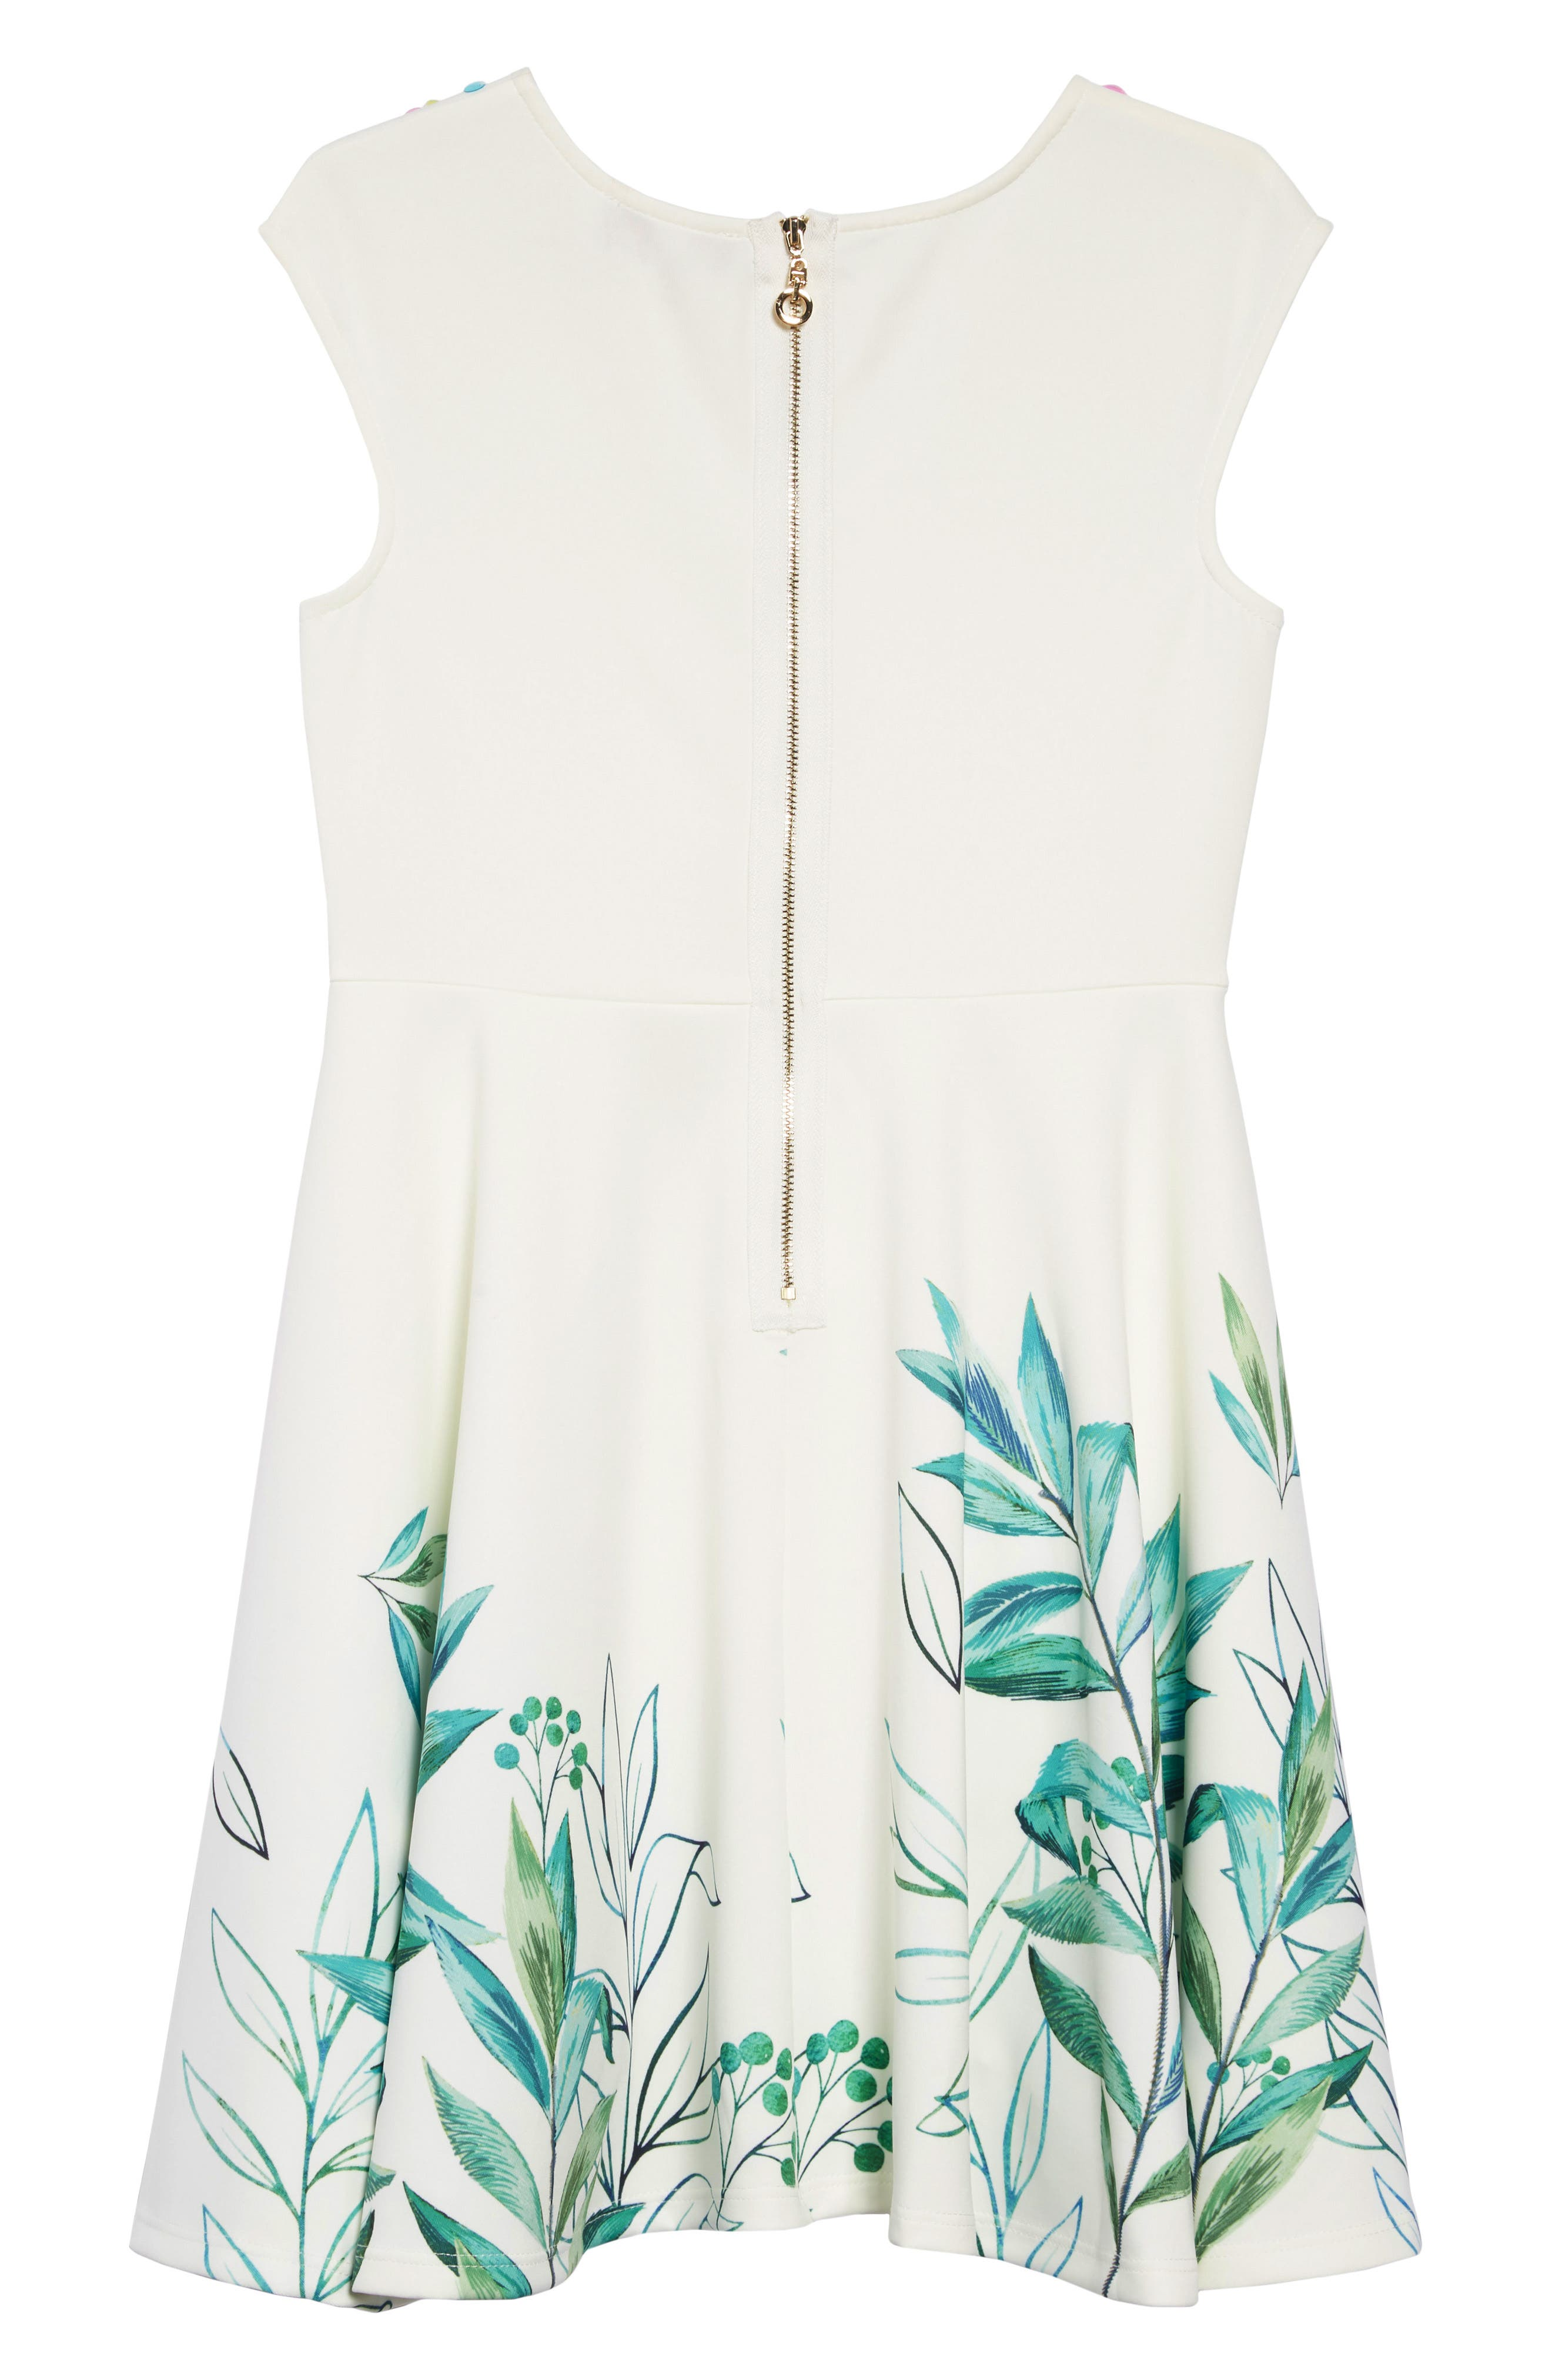 HANNAH BANANA, Leafy Print Embellished Dress, Alternate thumbnail 2, color, 100